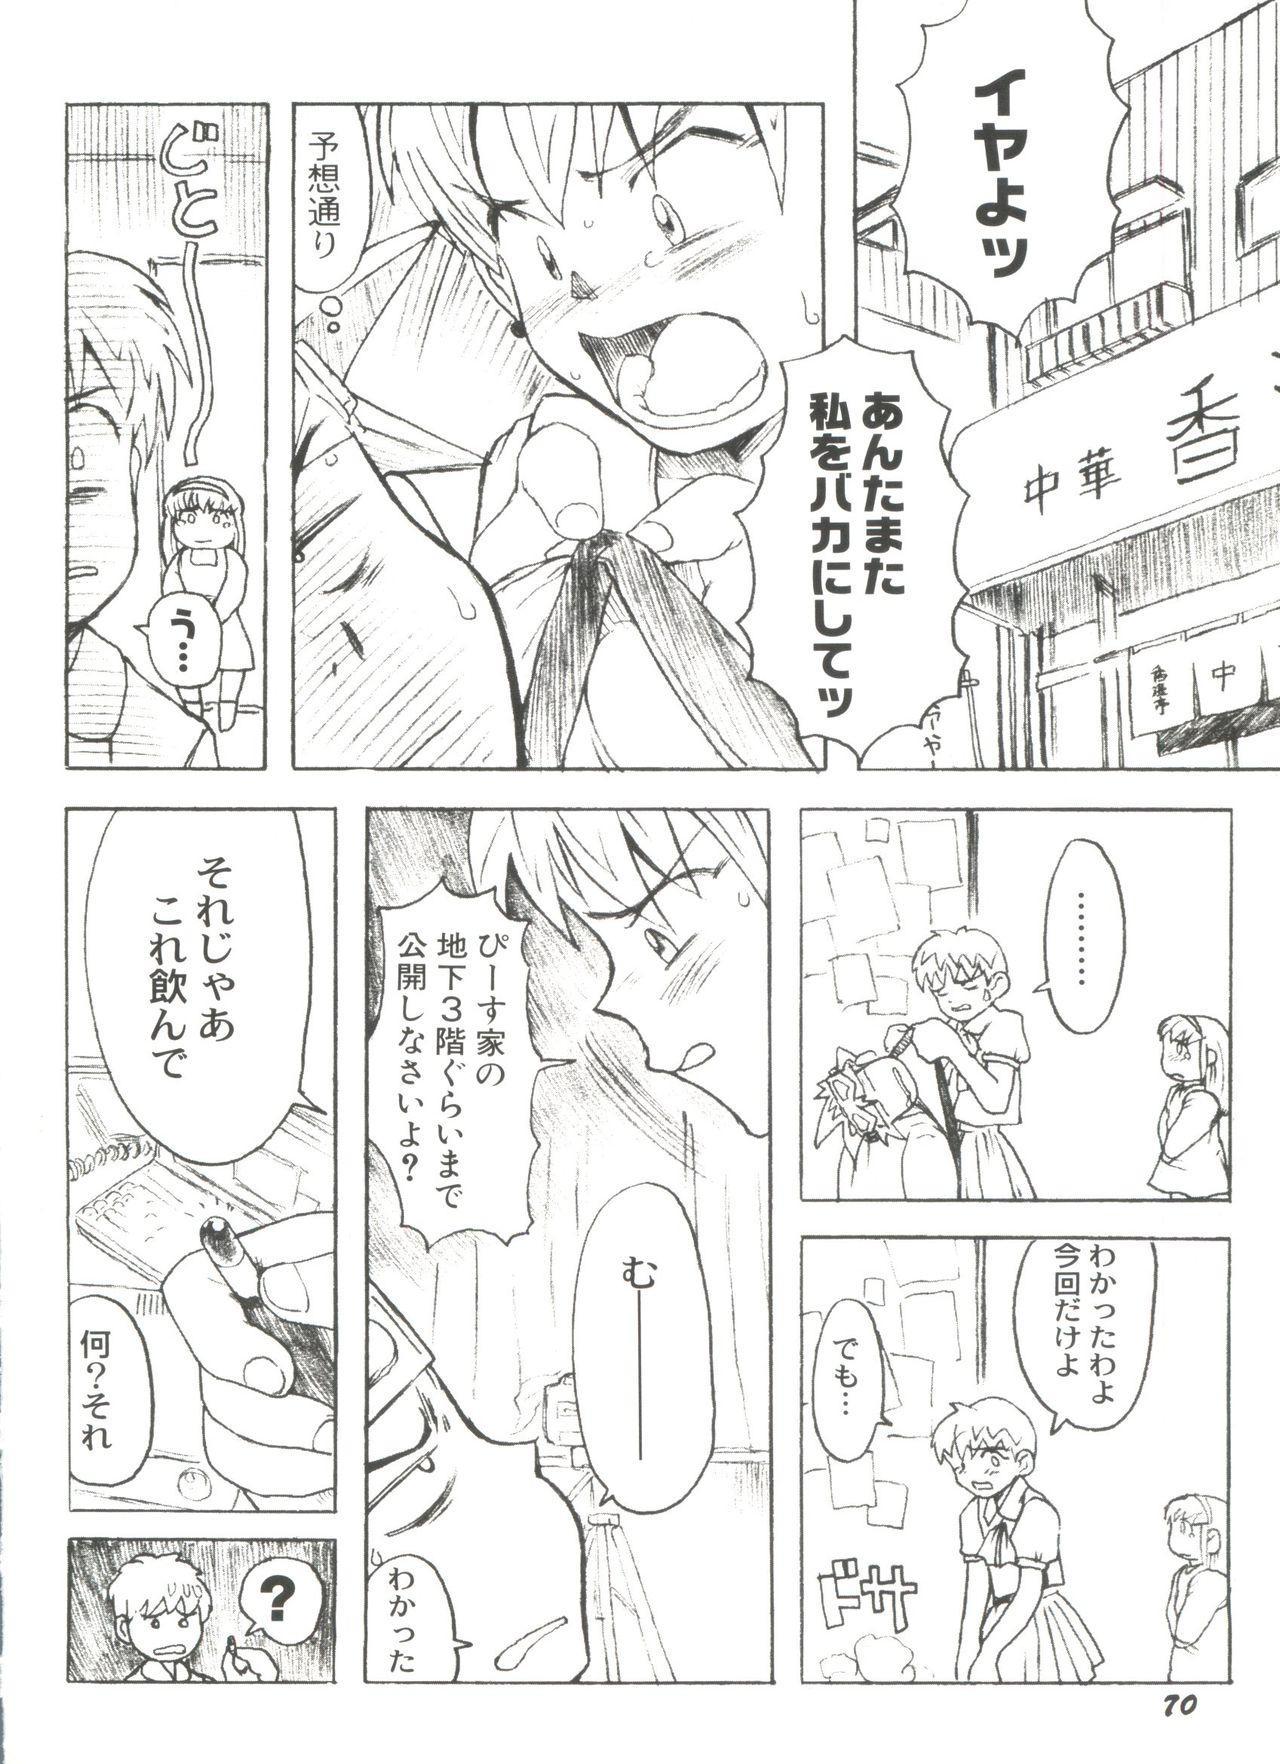 [Anthology] Denei Tamatebako 8 - Utakata no Tenshi-tachi II (Various) 71